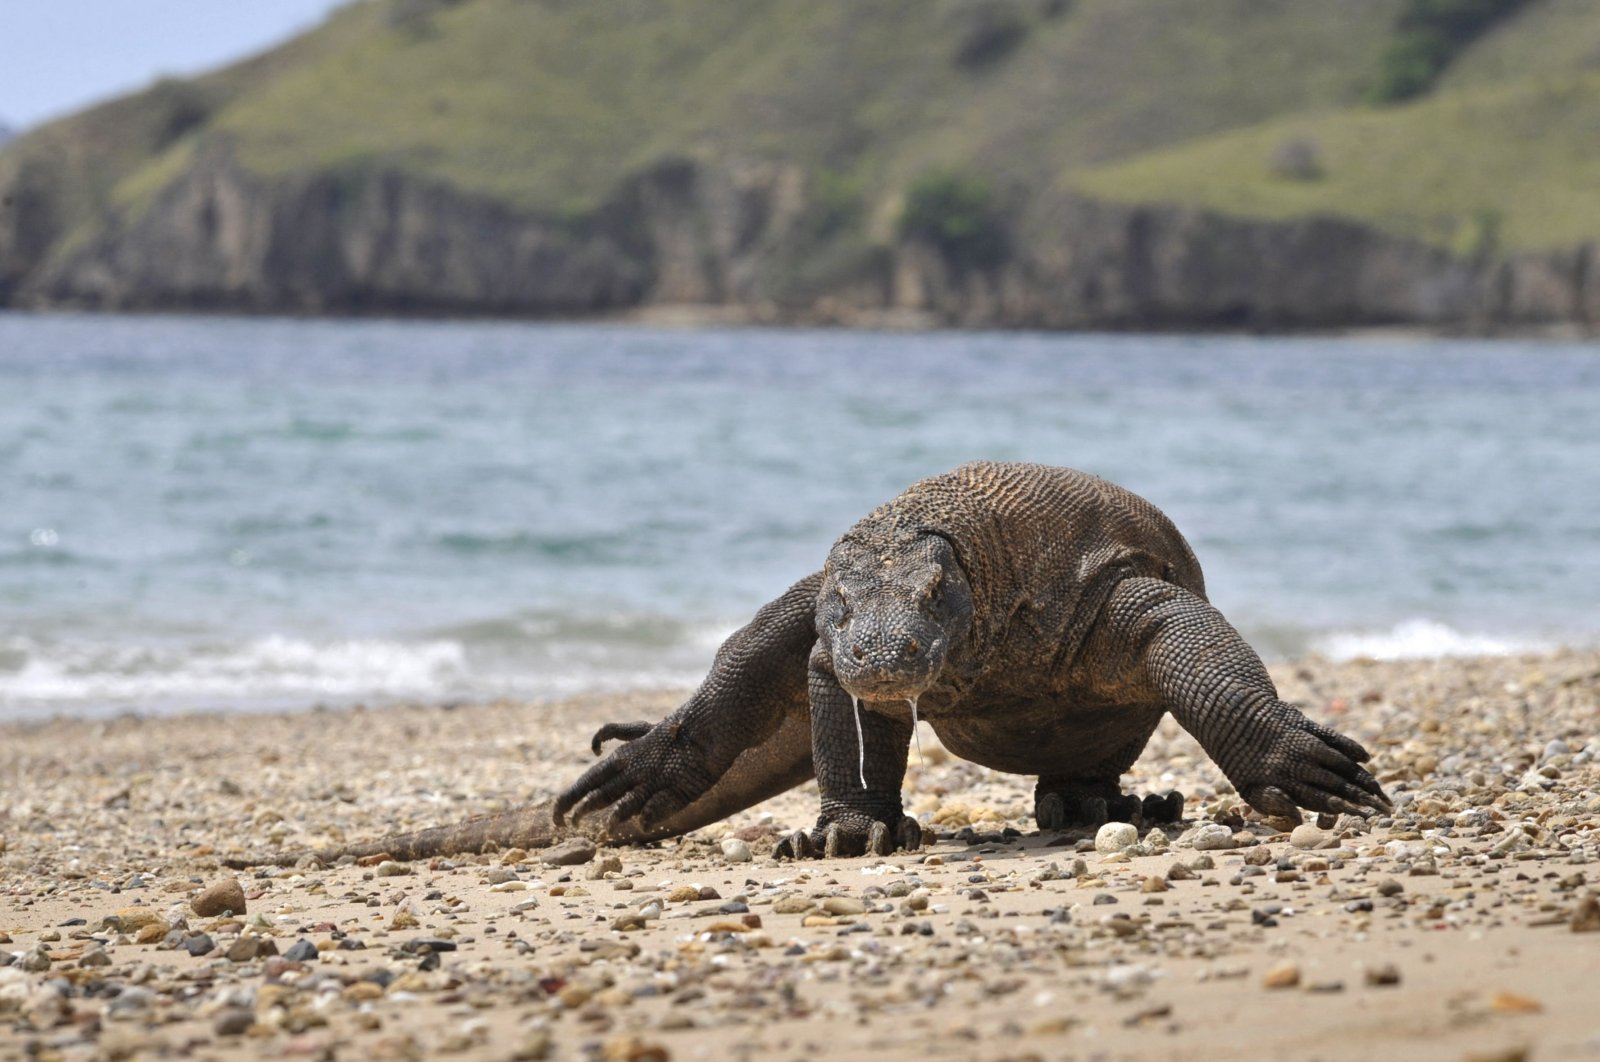 A Komodo Dragon searches the shore area of Komodo island for prey, Dec. 2, 2010. (AFP Photo)